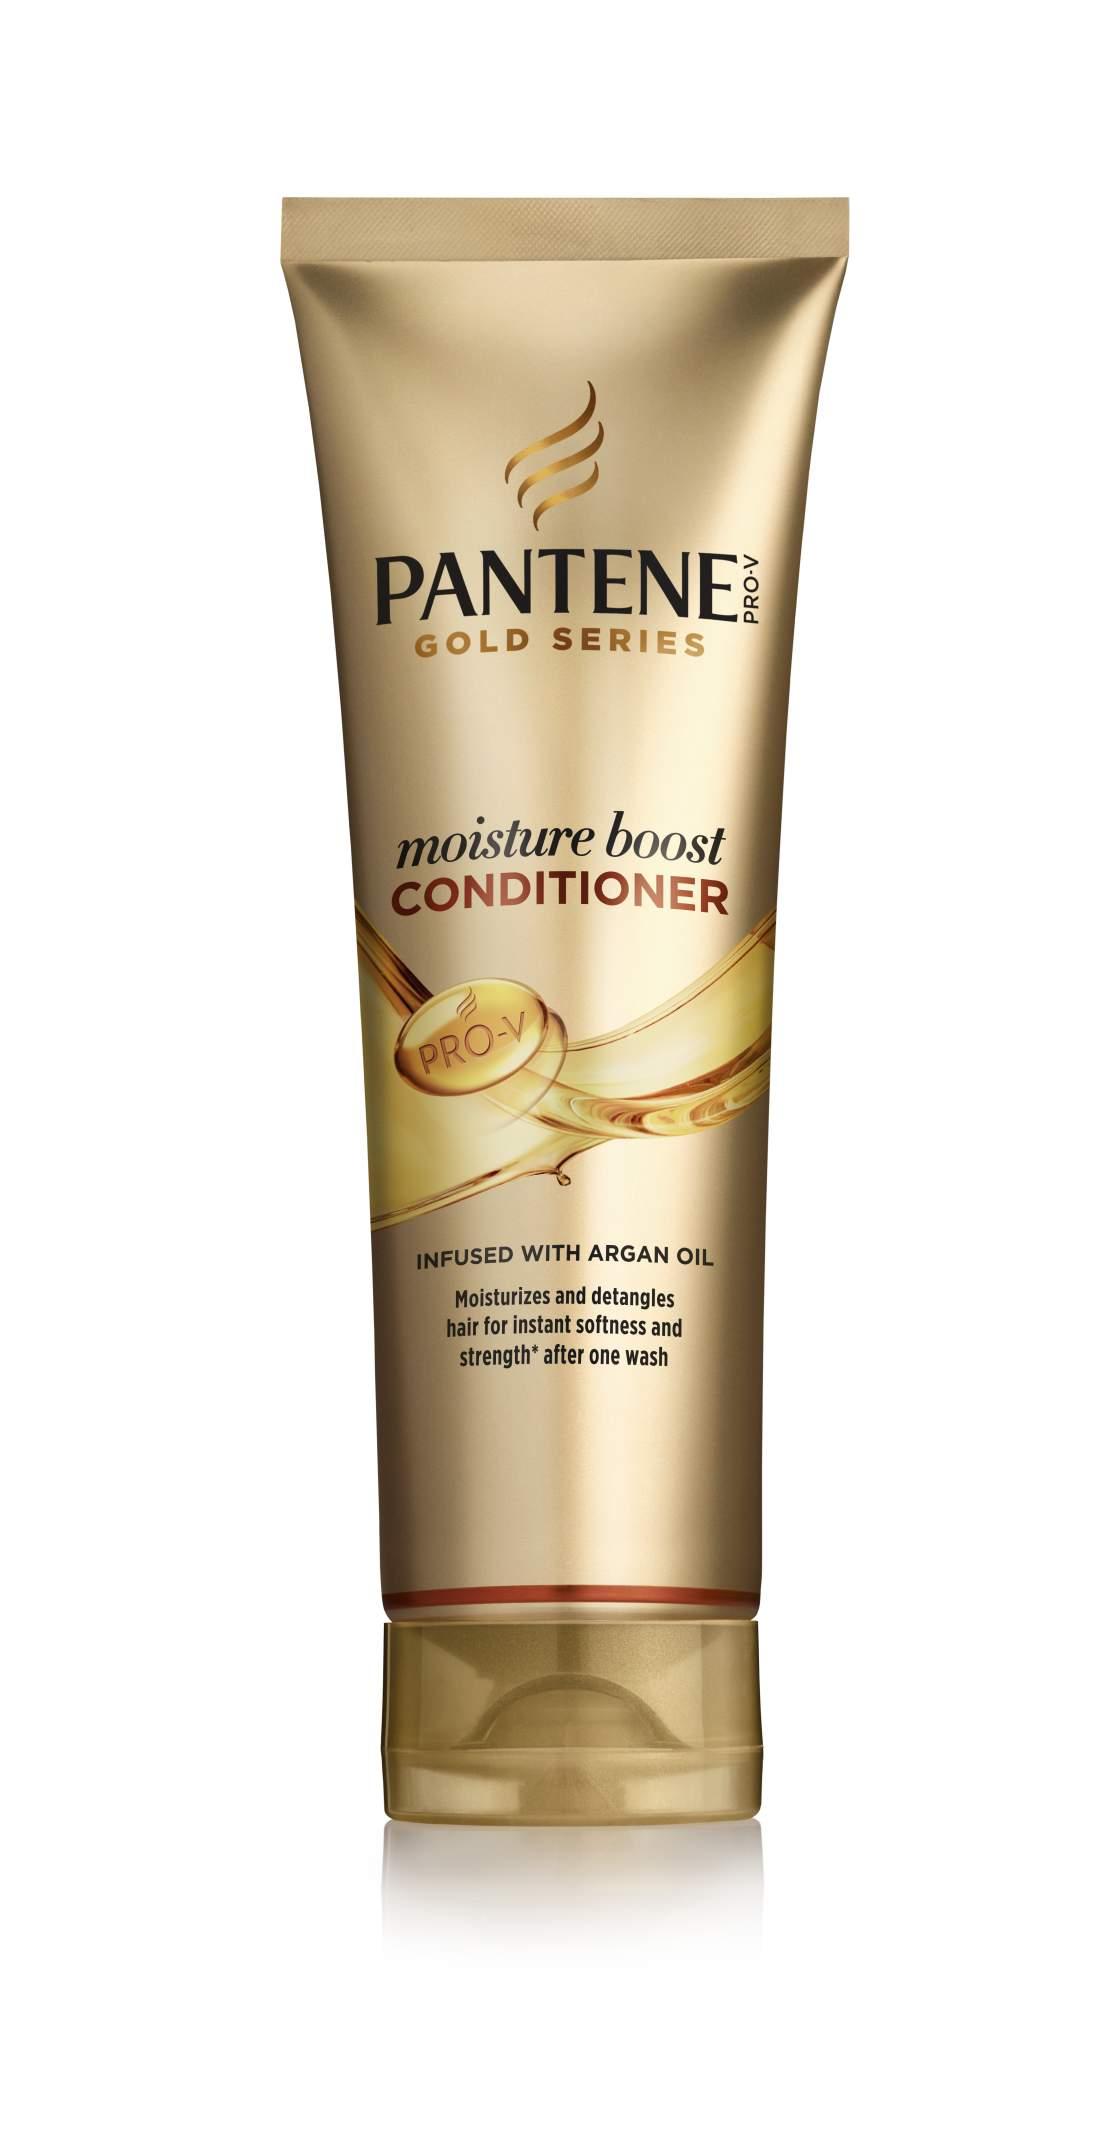 Pantene Pro-V Gold Series Moisture Boost Conditioner